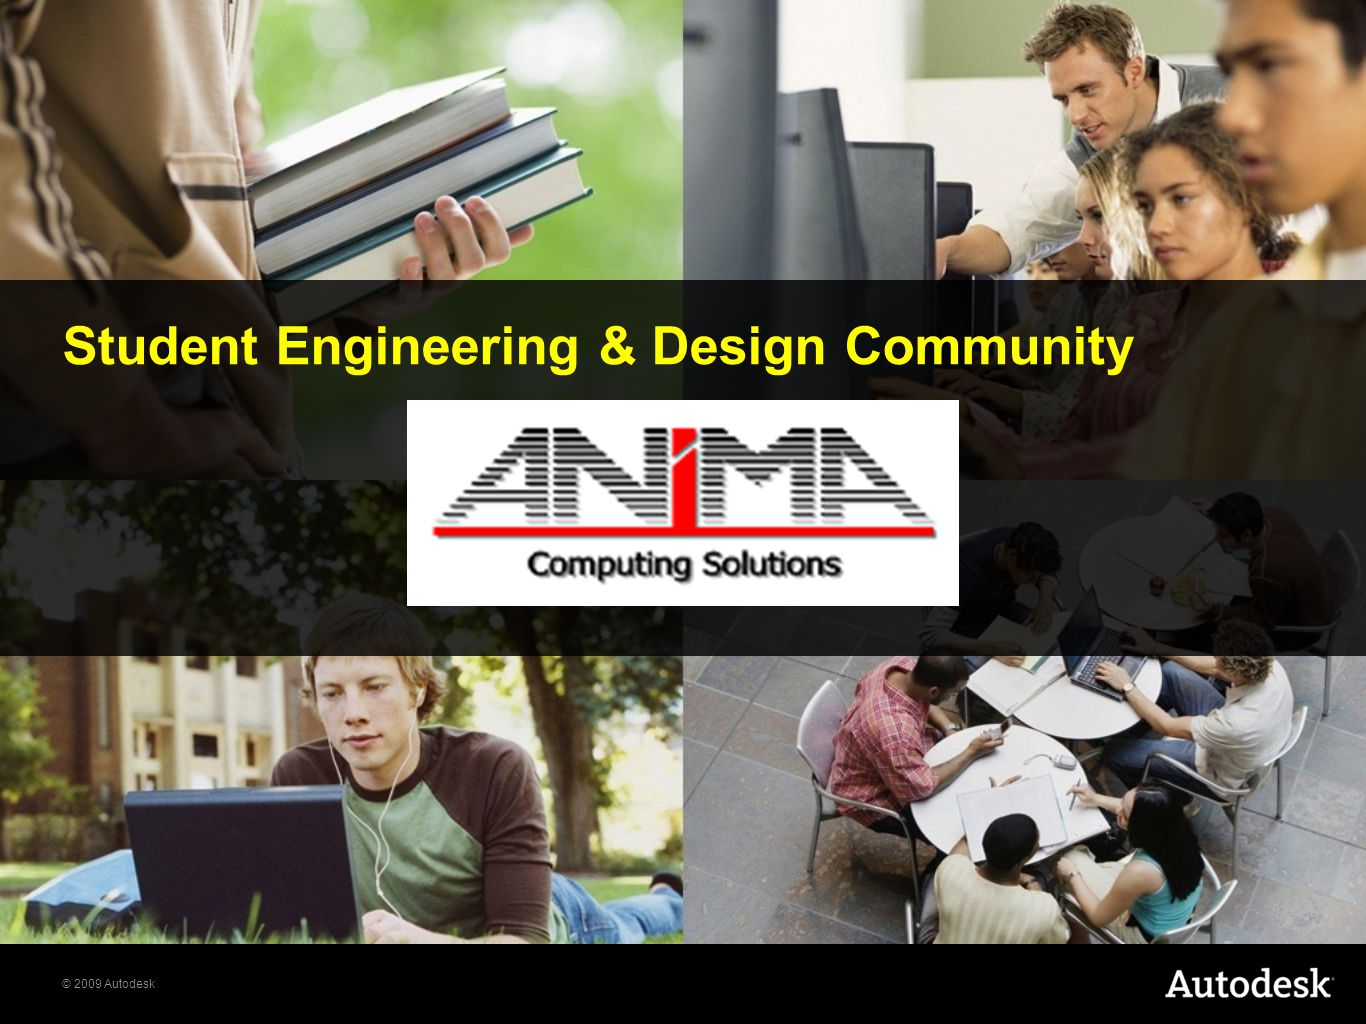 © 2009 Autodesk Student Engineering & Design Community http://students.autodesk.com